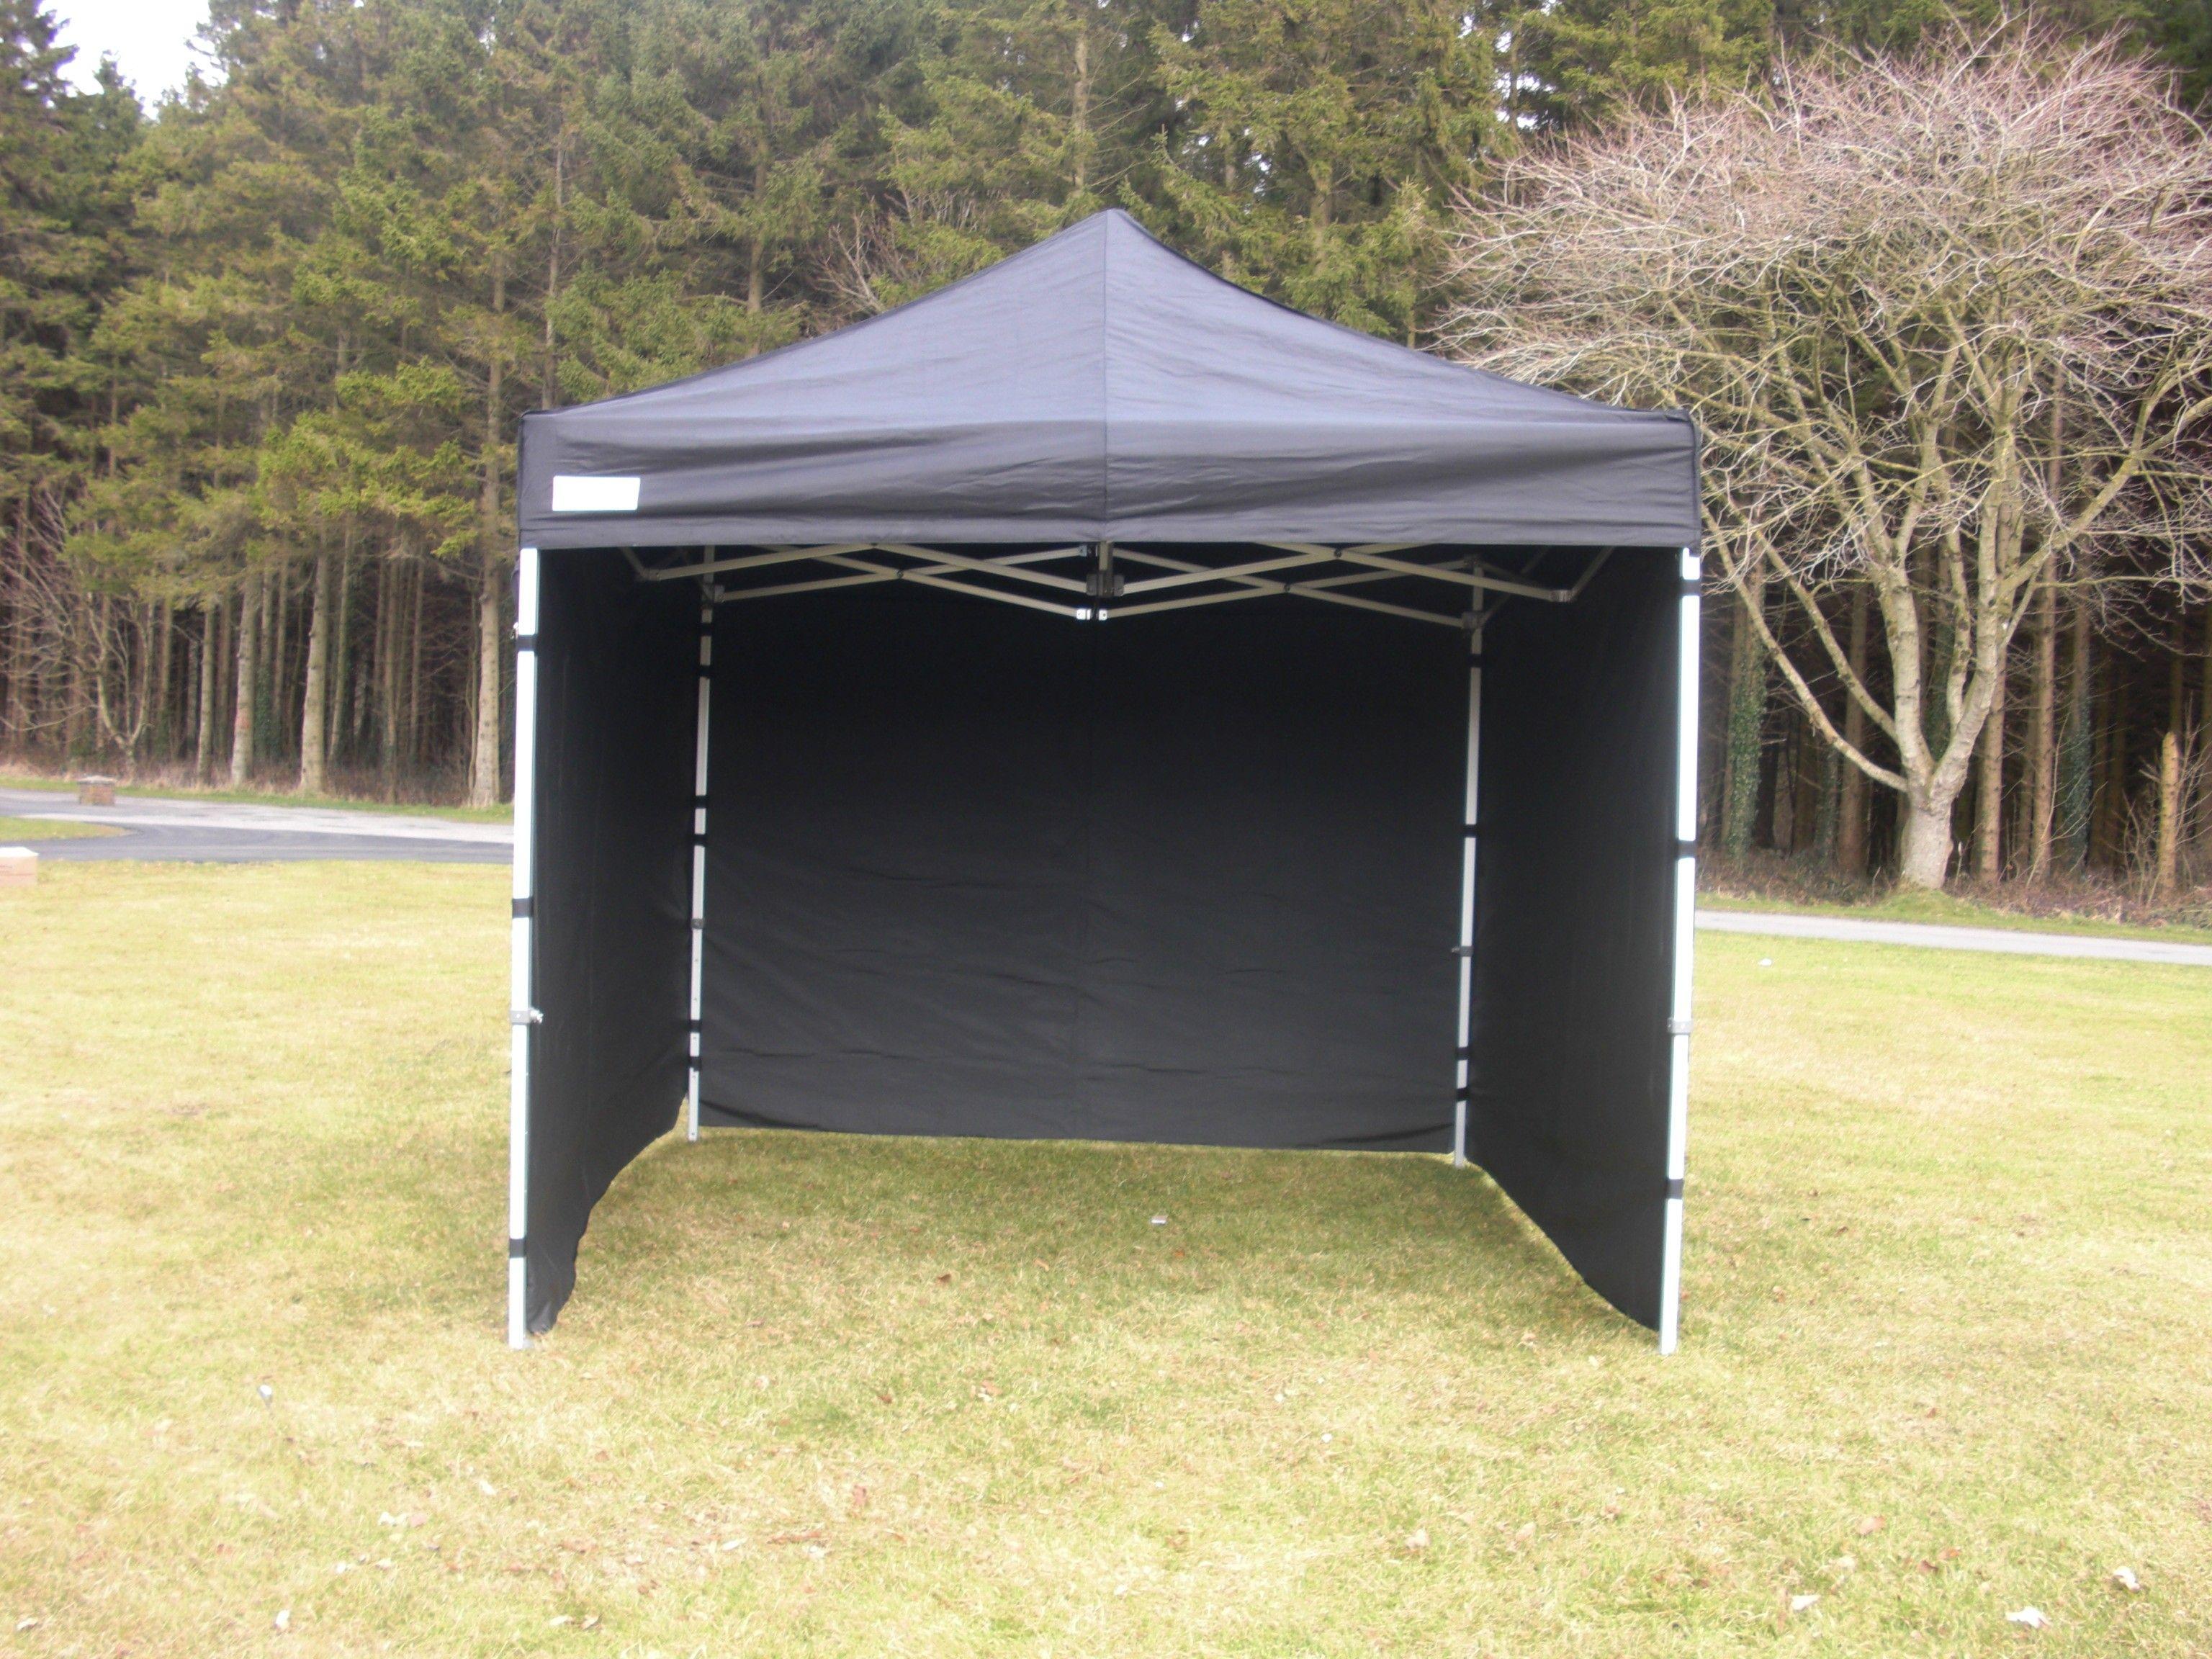 this 3m x 3m heavy duty industrial pop up gazebo black. Black Bedroom Furniture Sets. Home Design Ideas